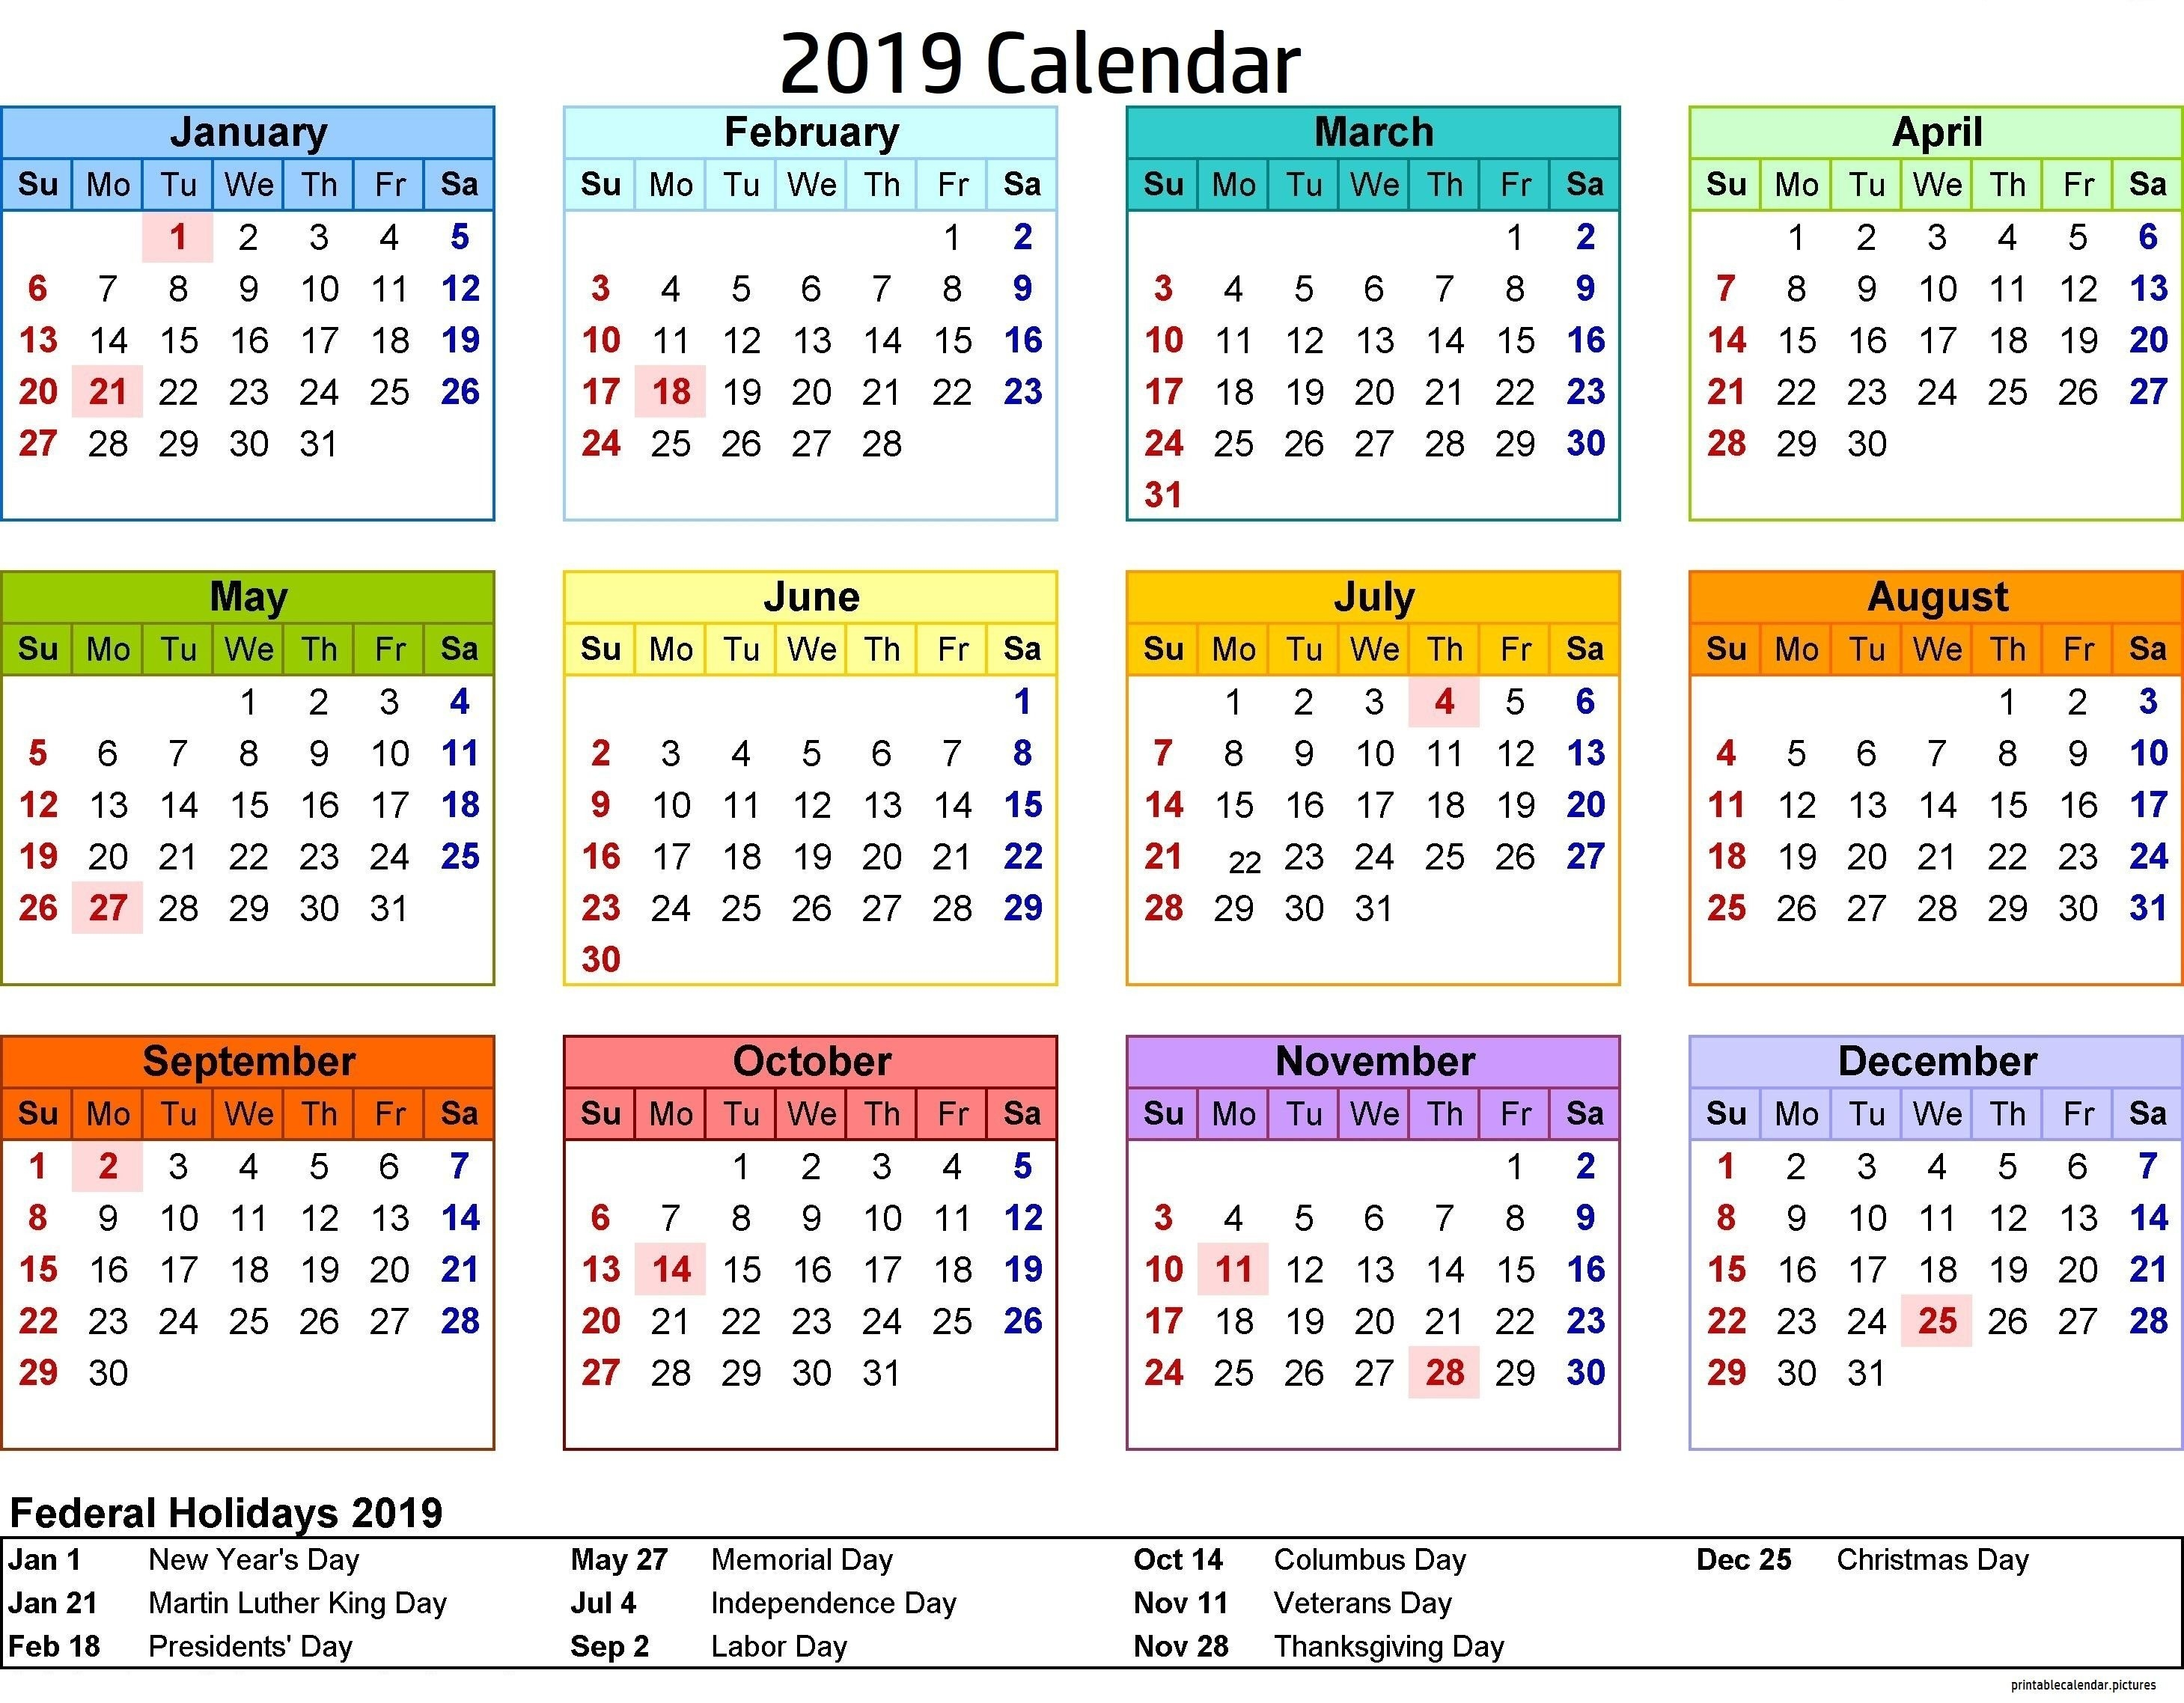 2019 Calendar Philippines With Holidays | 2019 Calendar Holidays Calendar Year 2019 Philippines